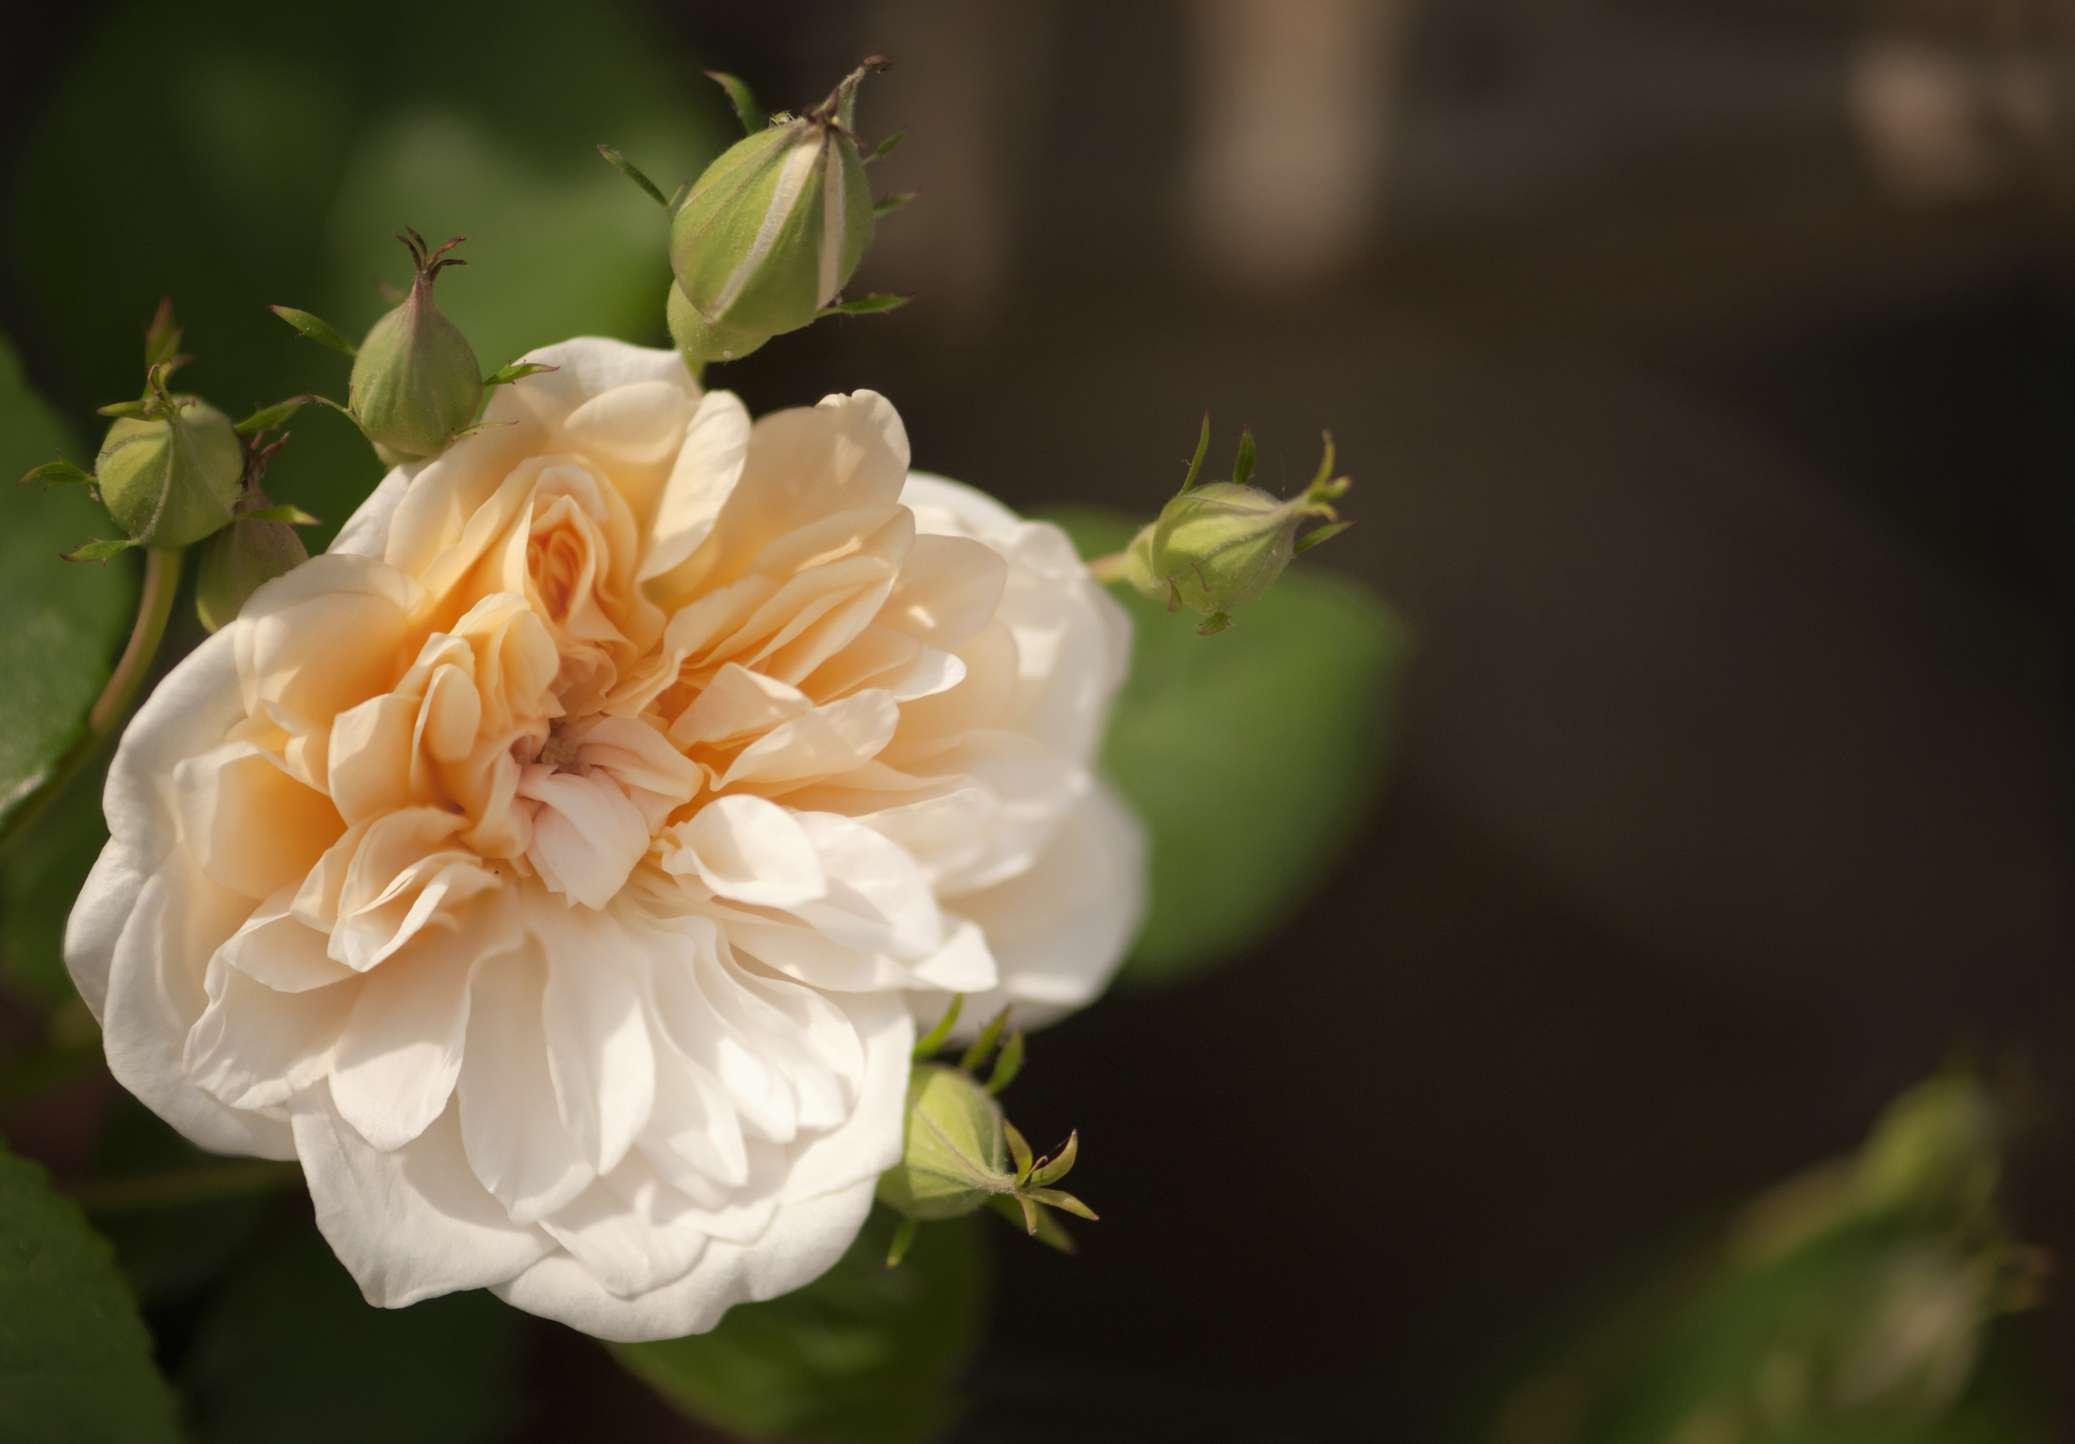 Noisette rose closeup.